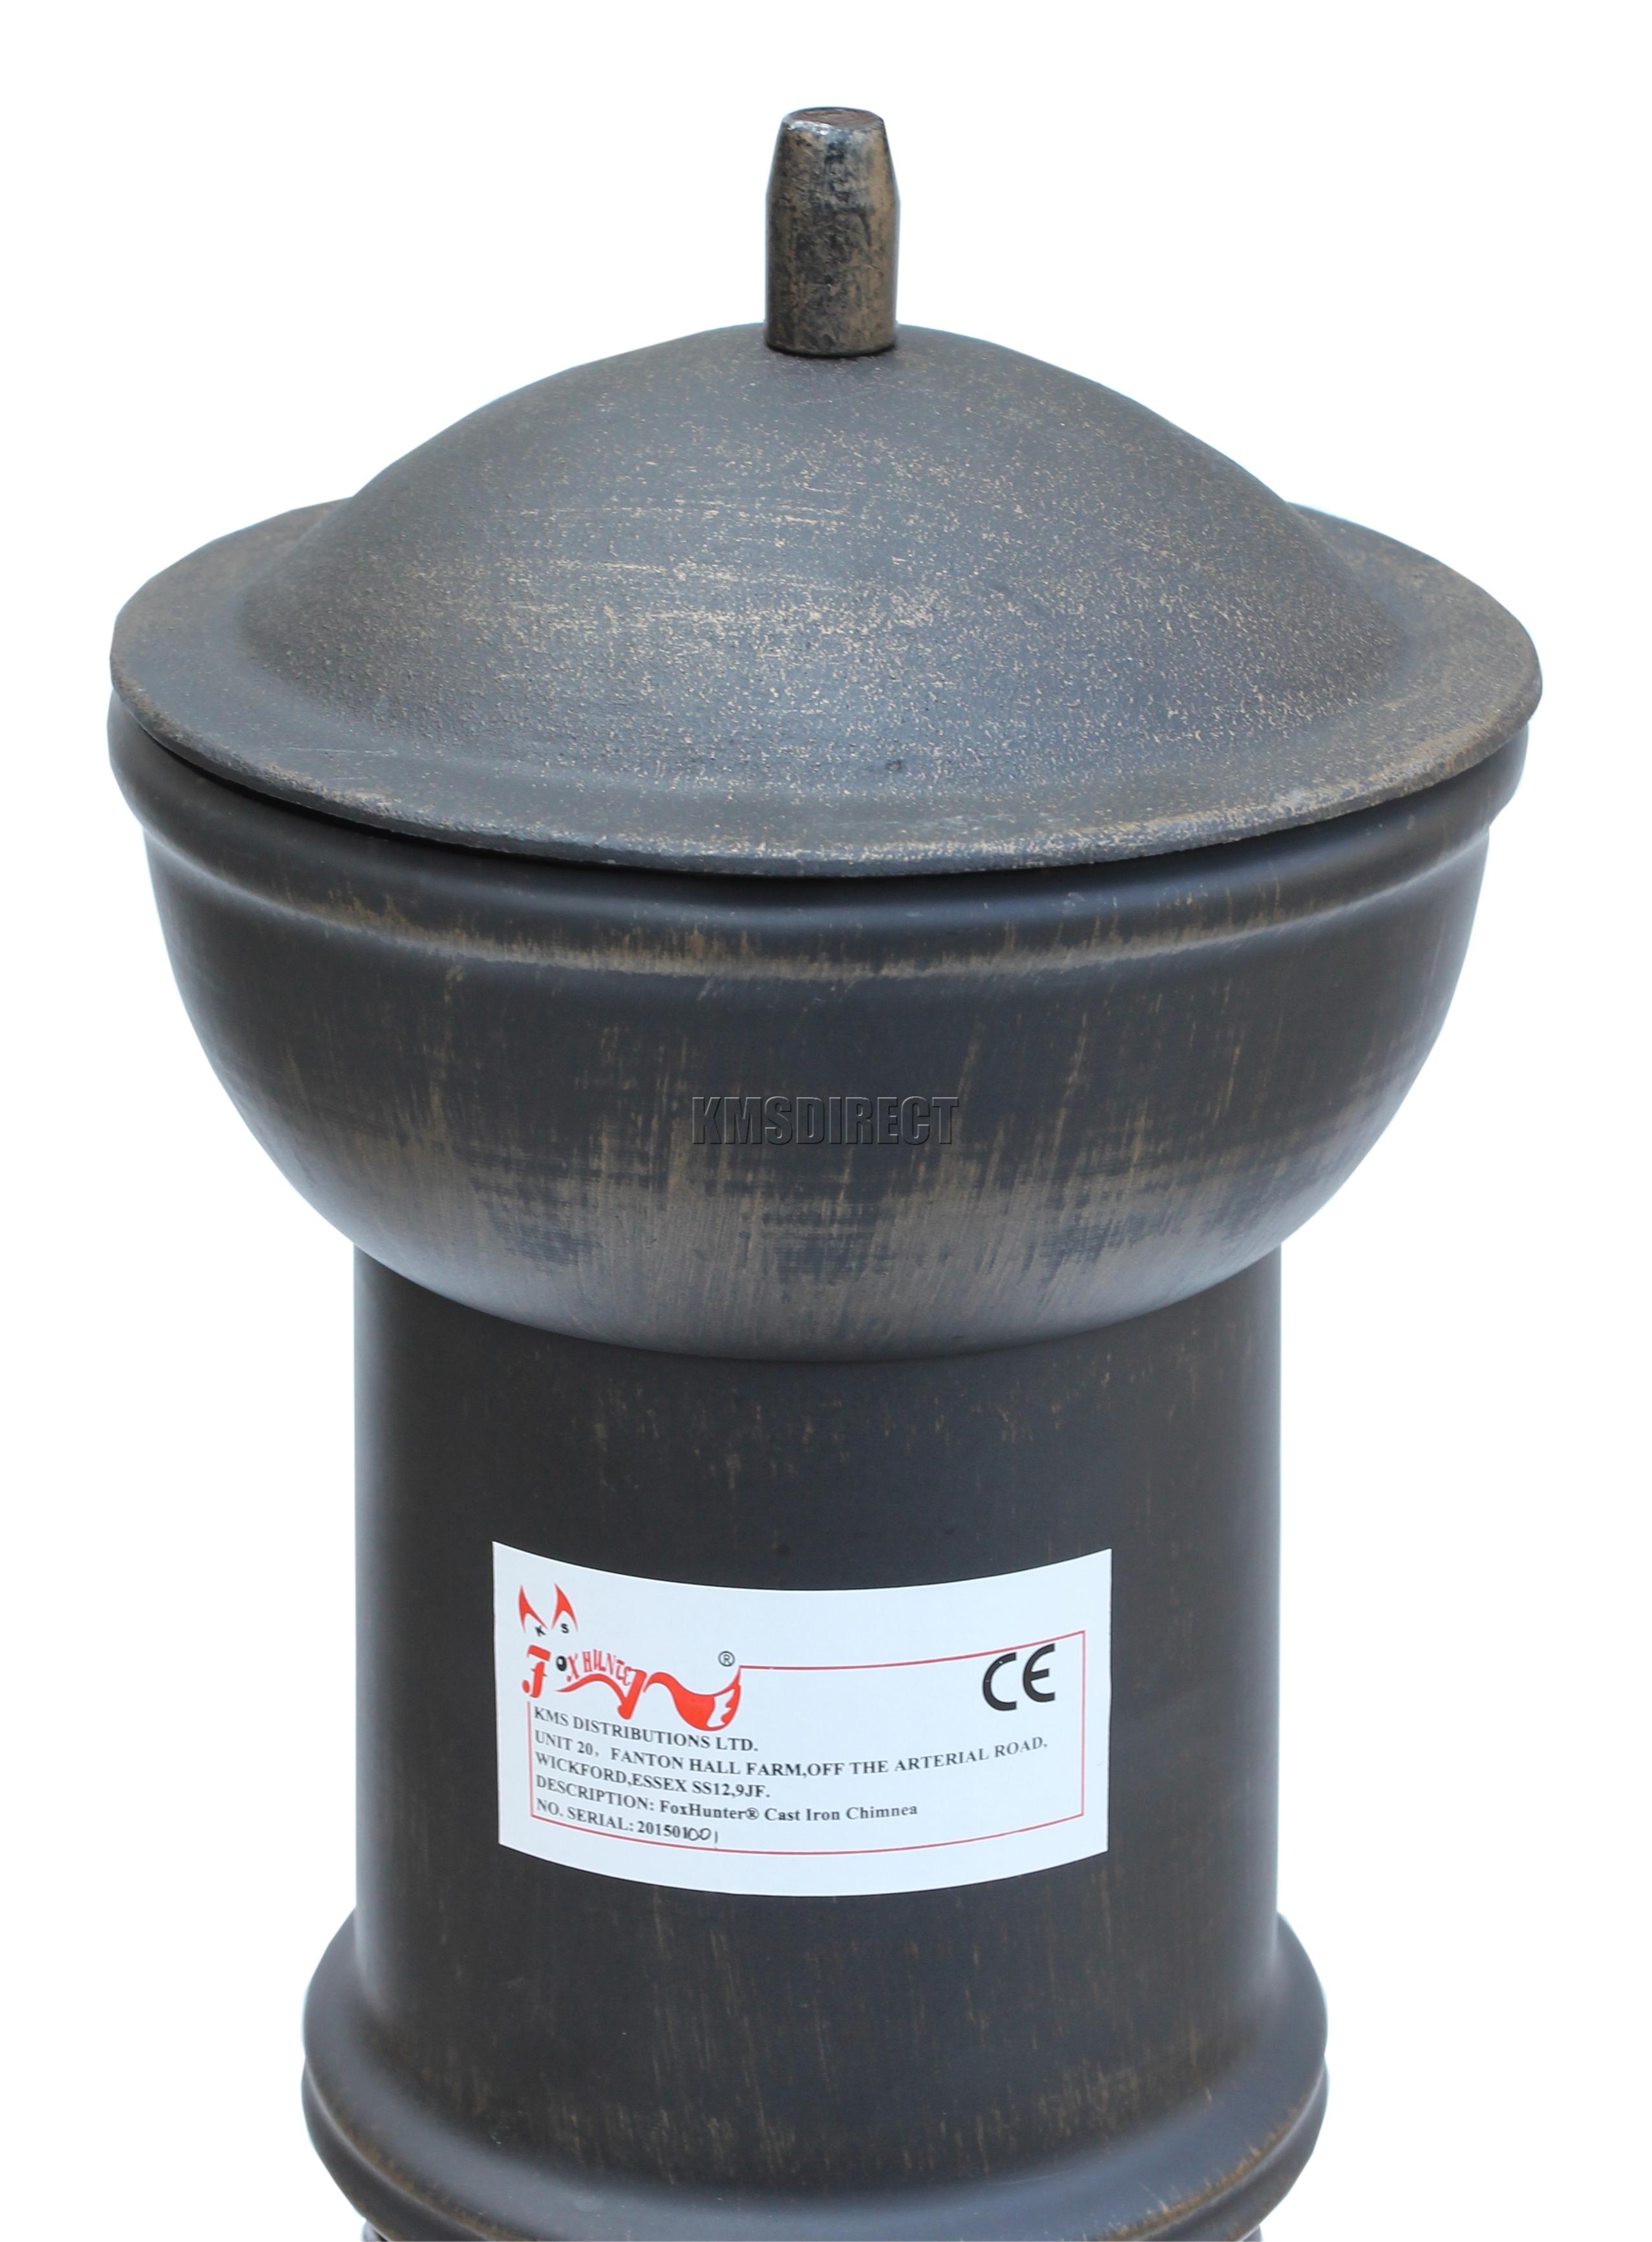 FoxHunter Garden Cast Iron Steel Chimenea Chiminea Chimnea